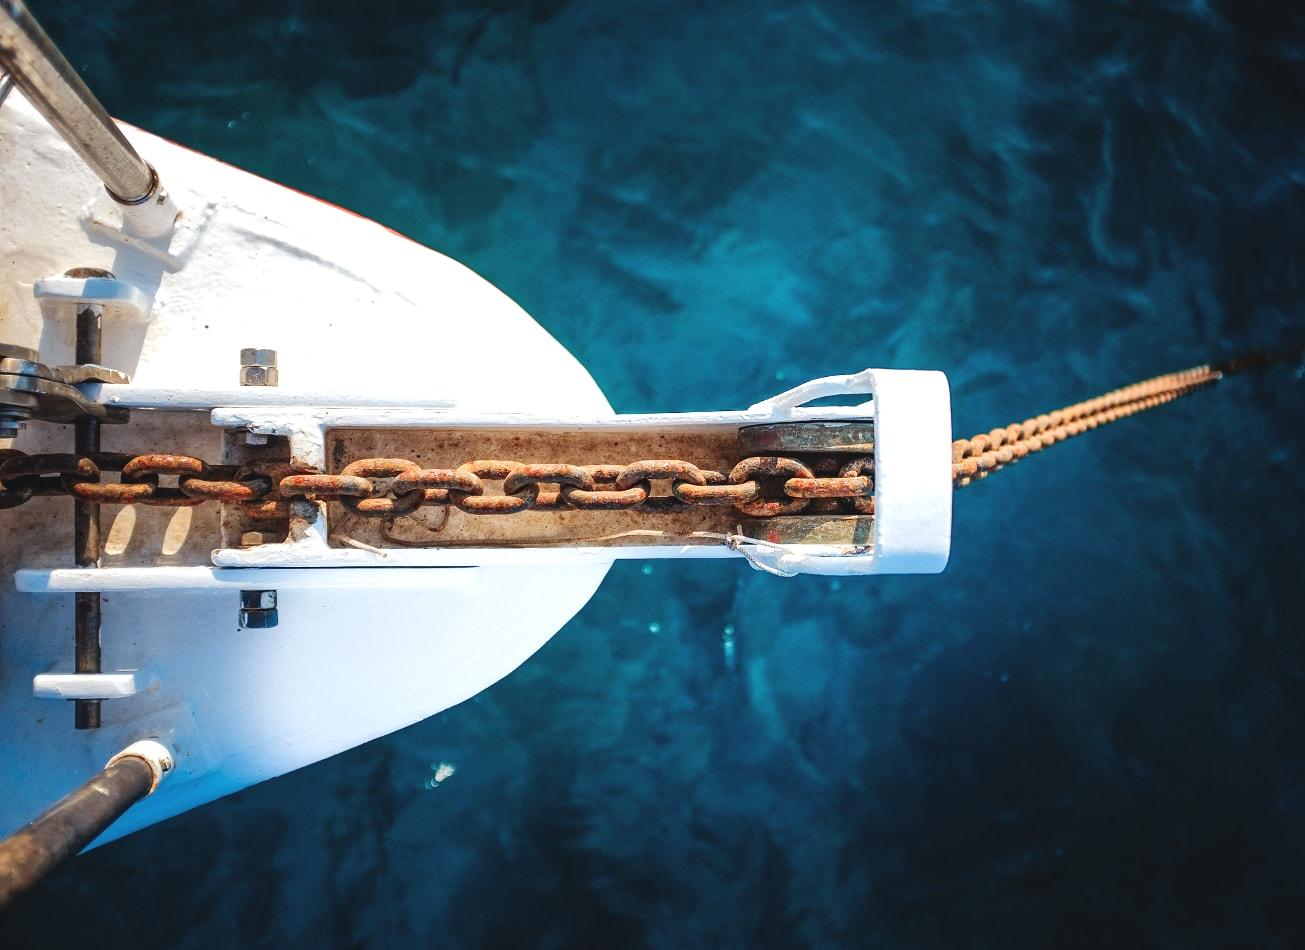 virée pêche en haute mer poisson lisbonne activites vimigo